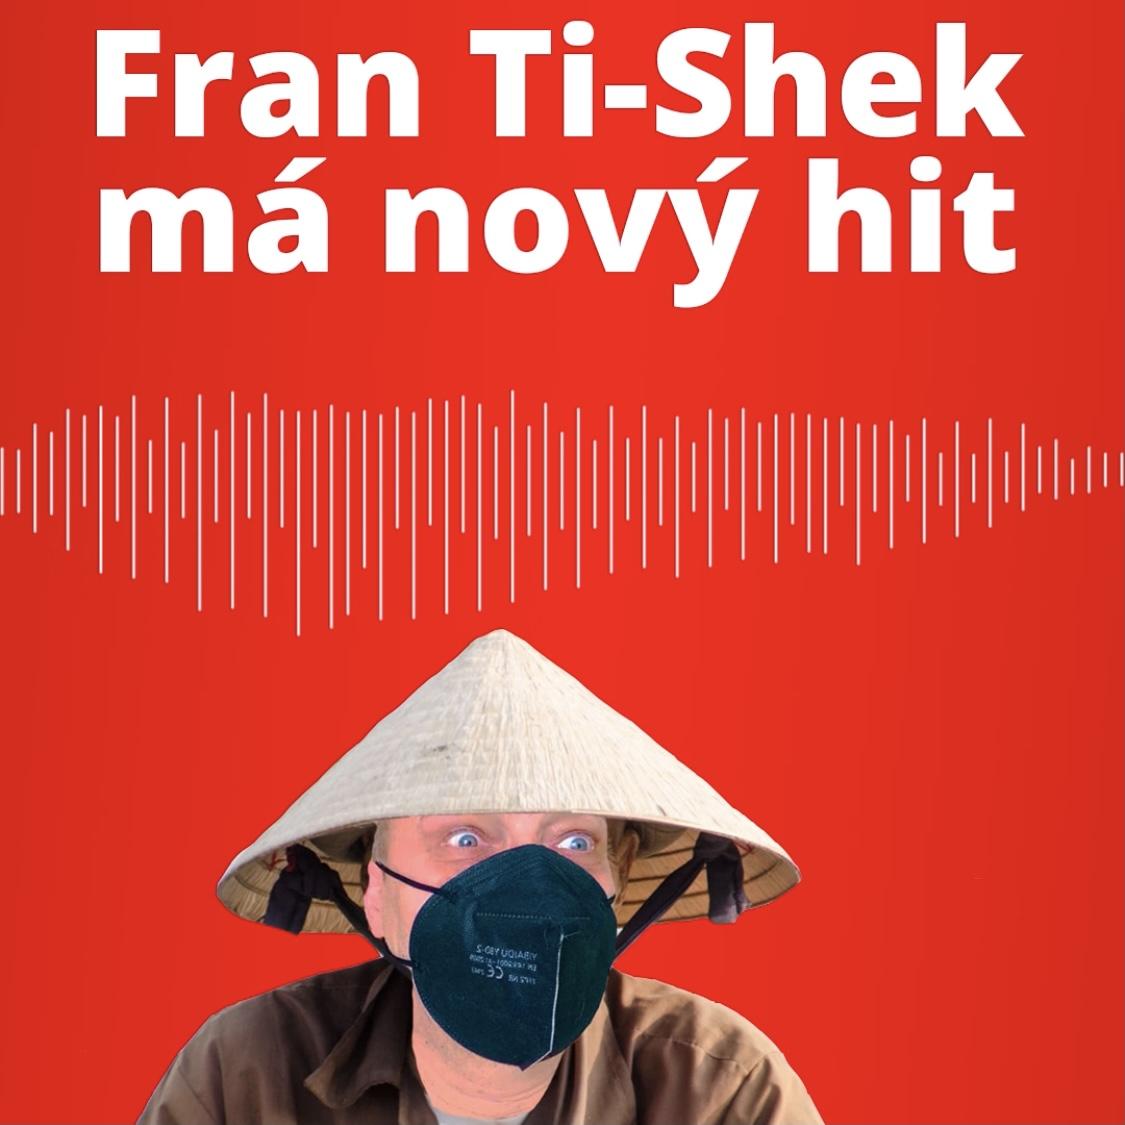 RANNÍ KISS - Fran Ti-Shek má nový hit